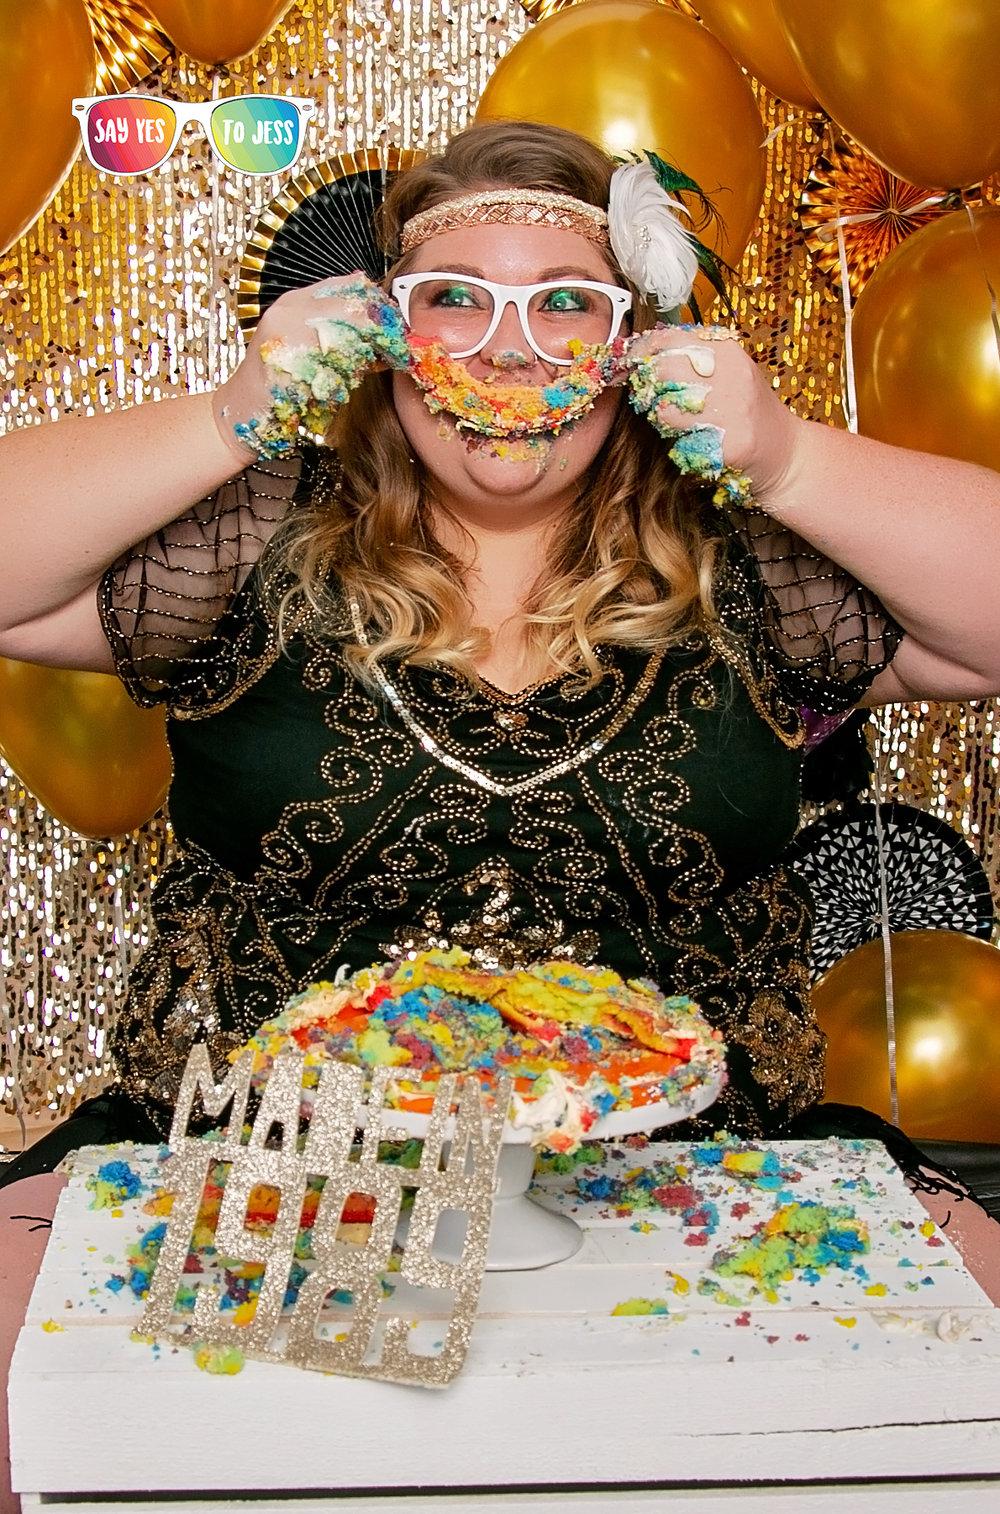 Cincinnati Ohio Adult Cake Smash happy 30th Birthday.jpg